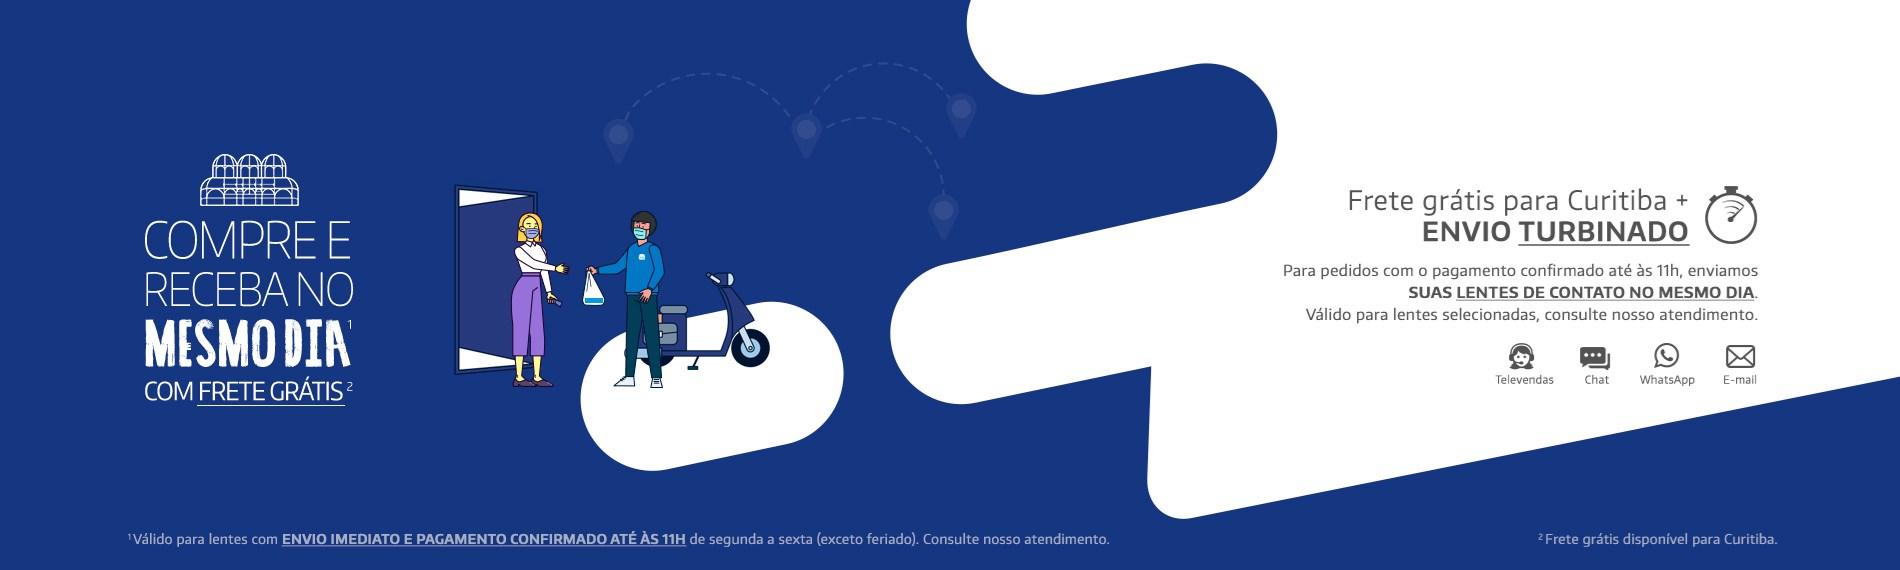 Curitiba + Atendimento